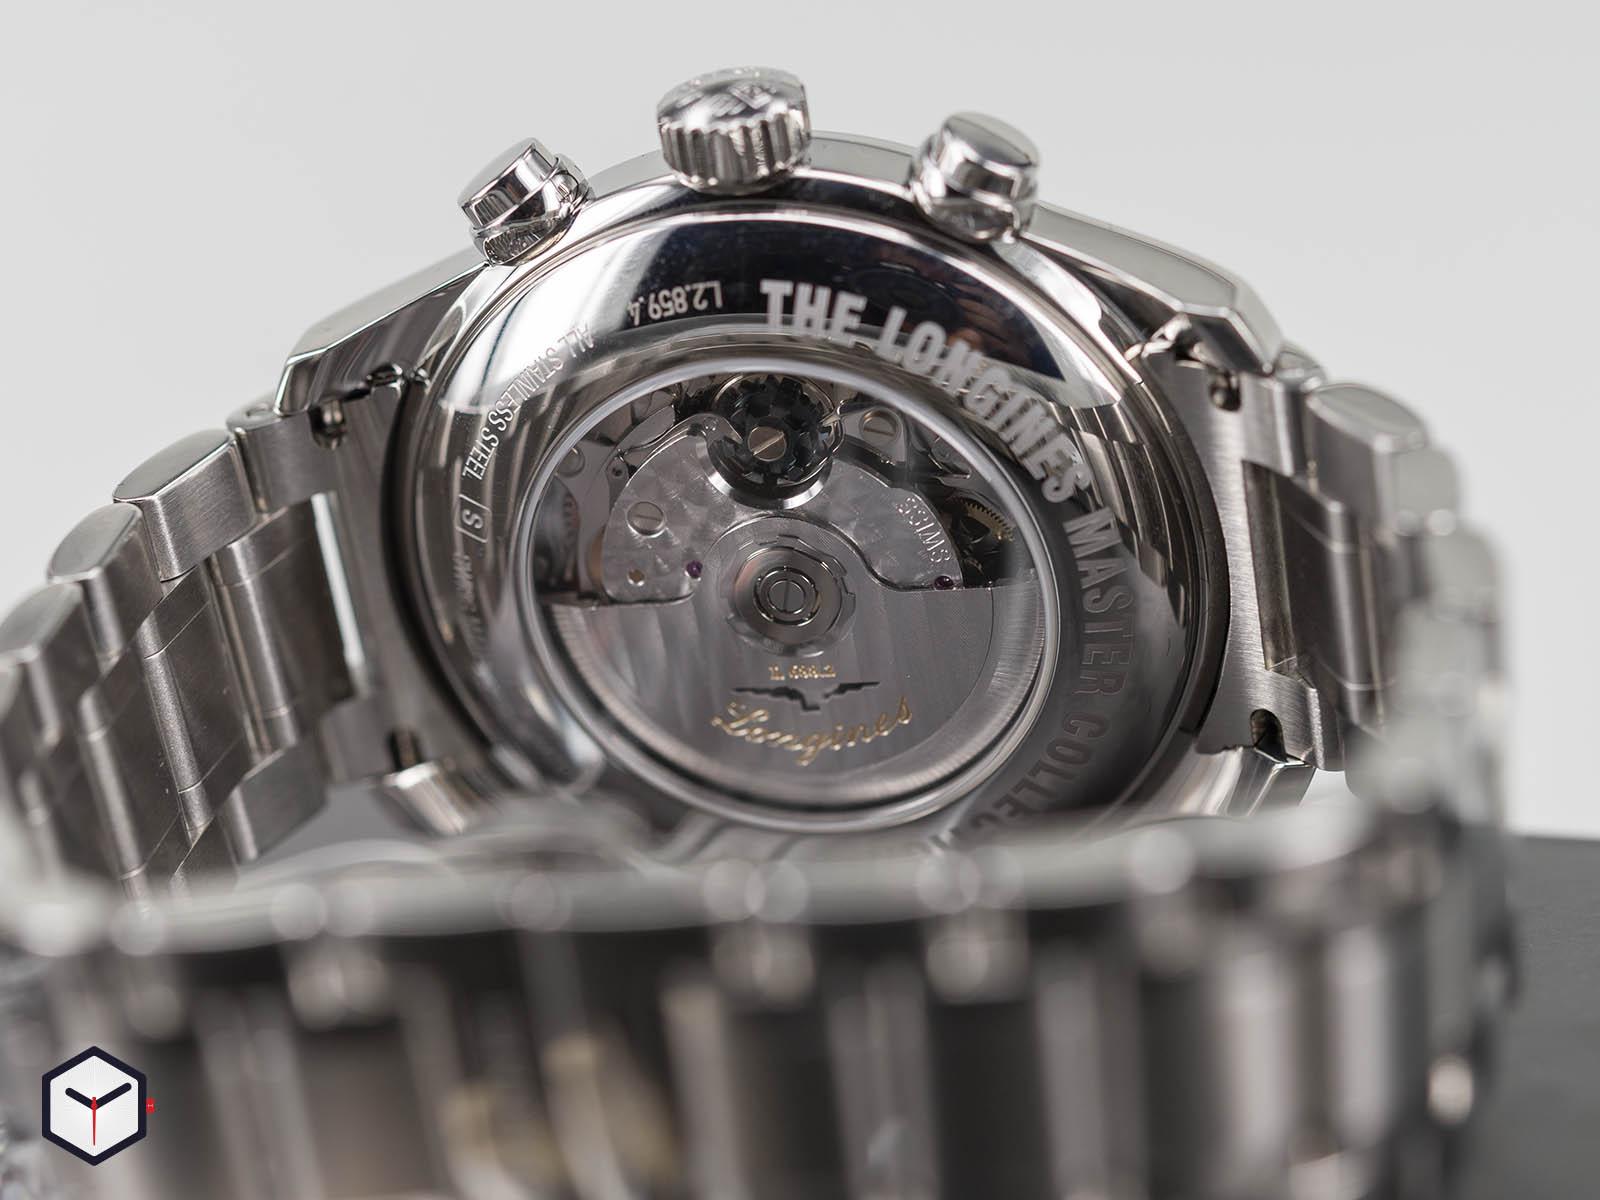 ll2-759-4-92-6-longines-master-collection-chronograph-6.jpg